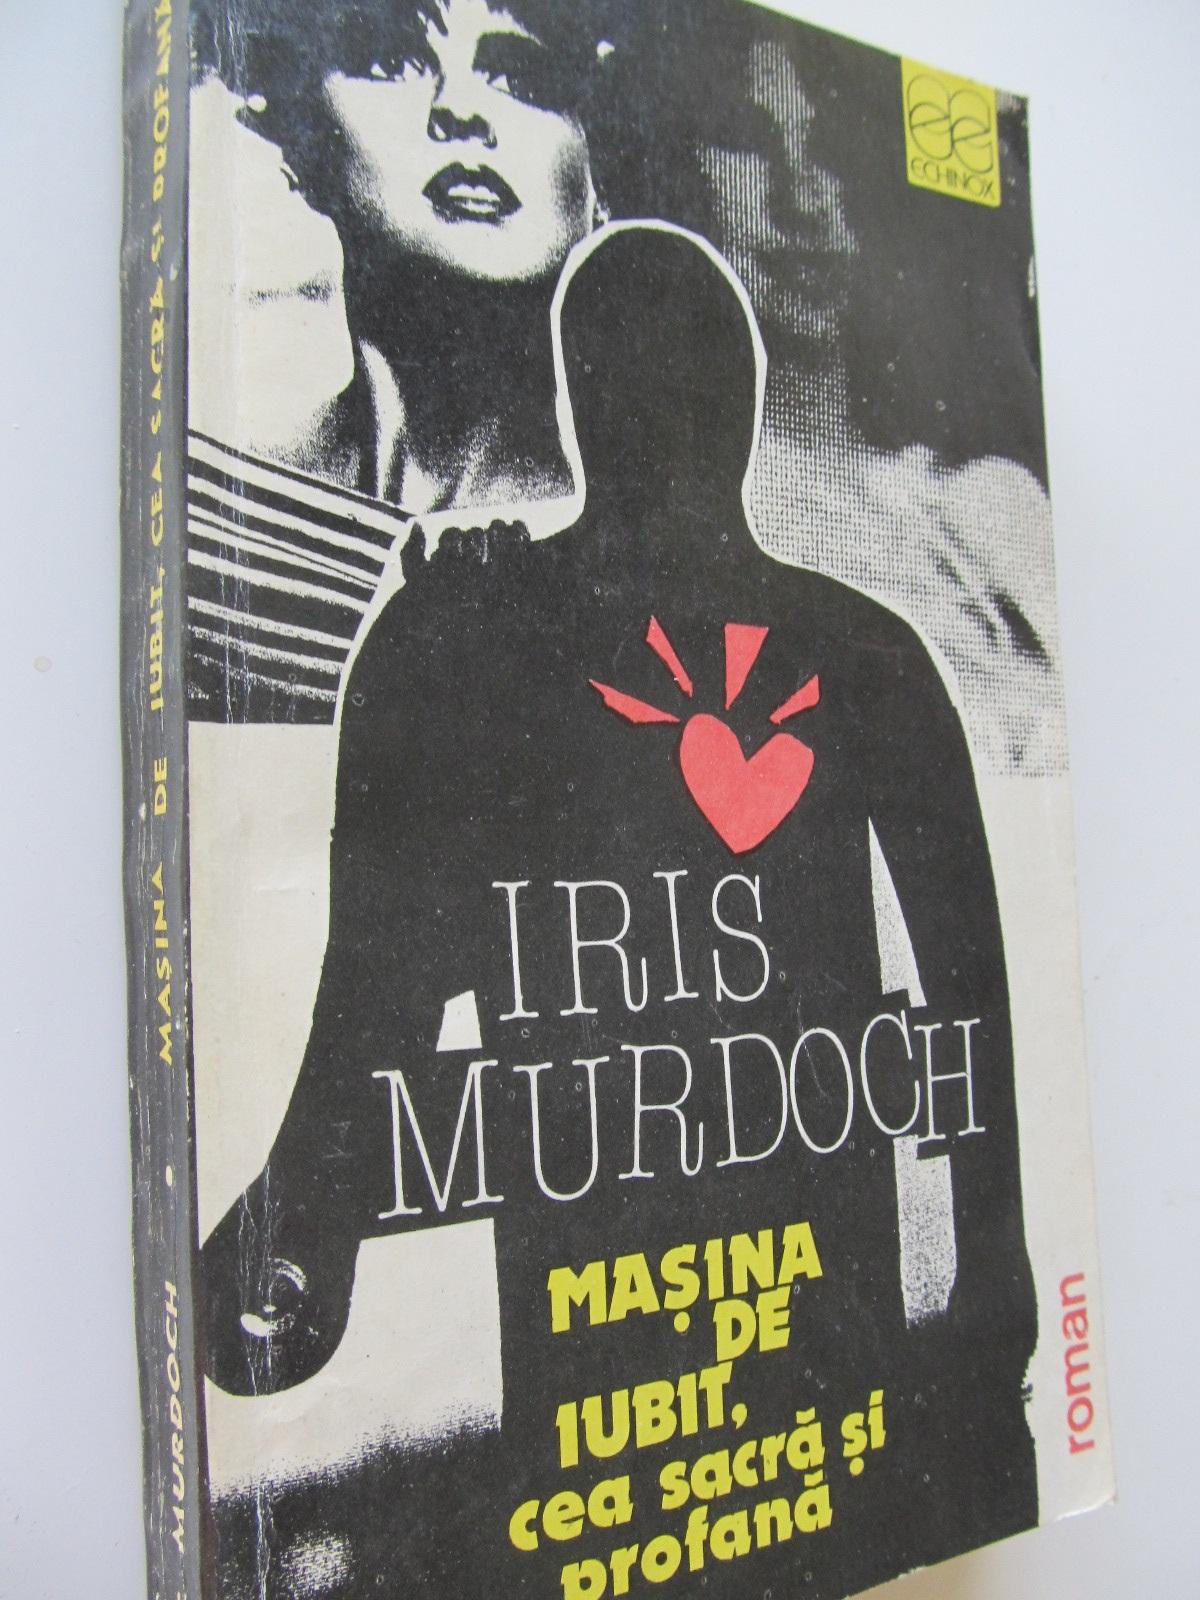 Masina de iubit , cea sacra si profana - Iris Murdoch | Detalii carte